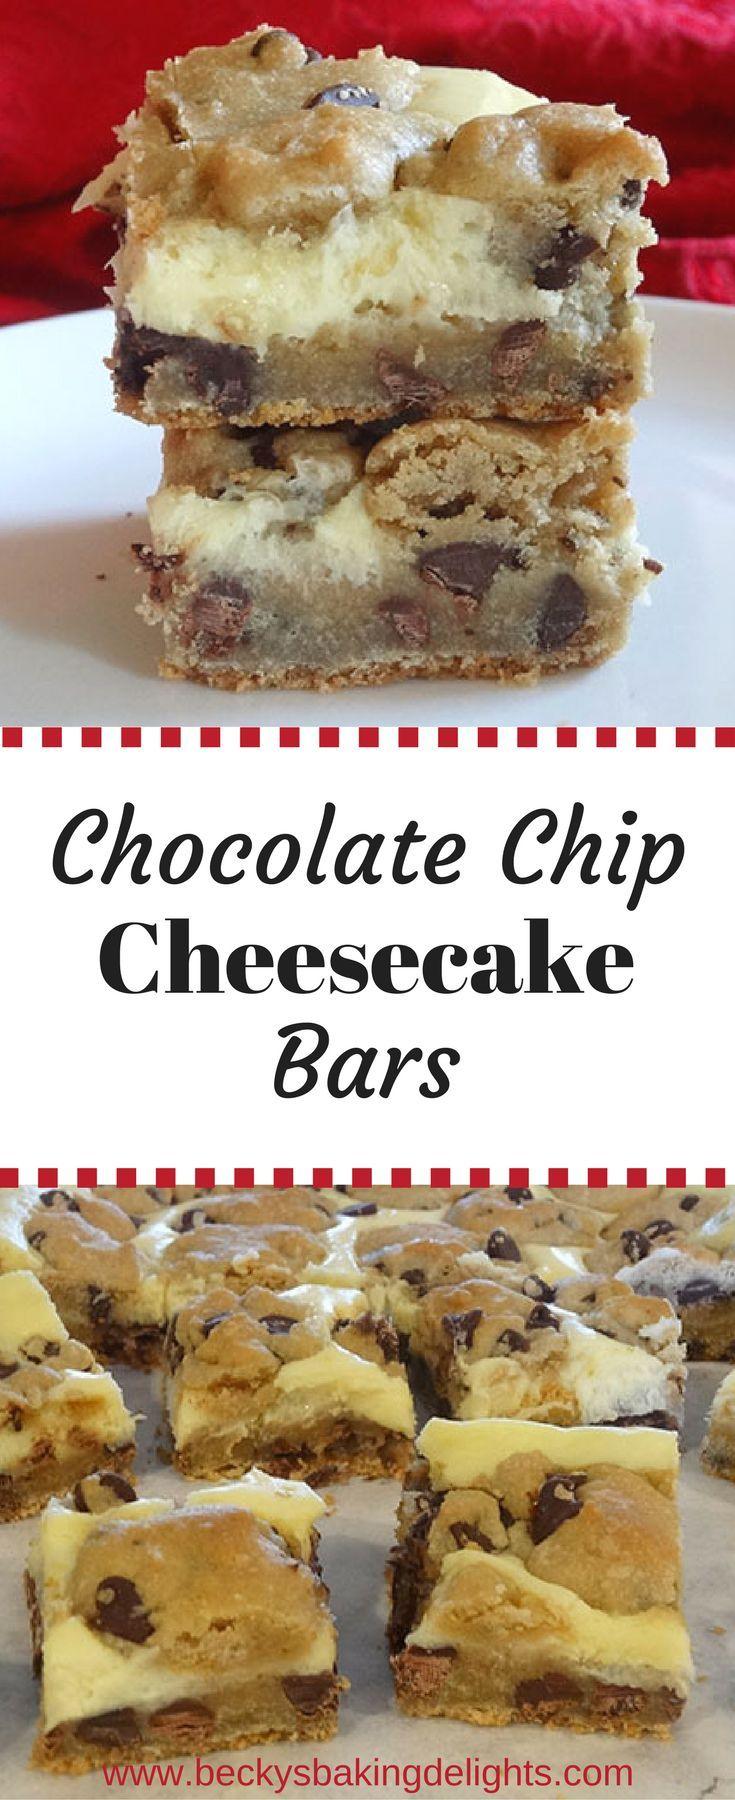 Chocolate Chip Cheesecake BarsBethany